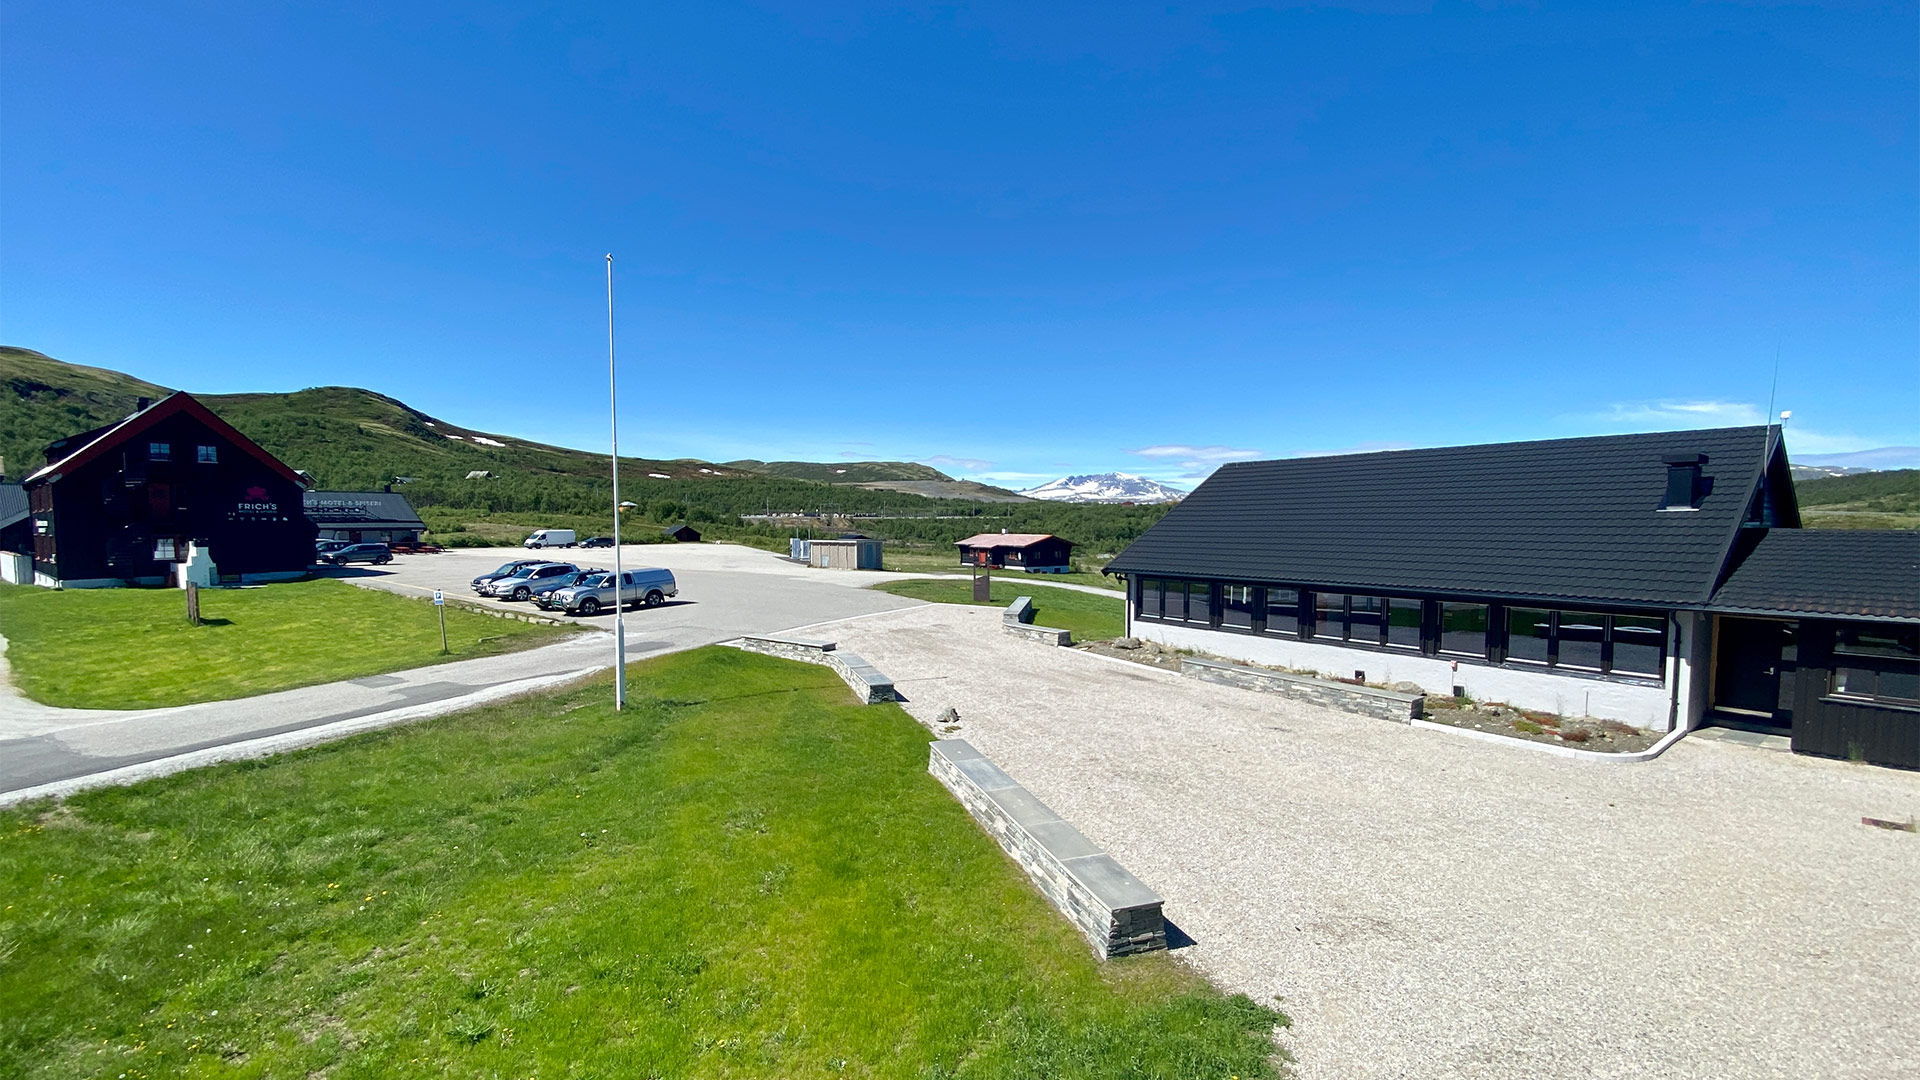 viewpoint SNØHETTA.